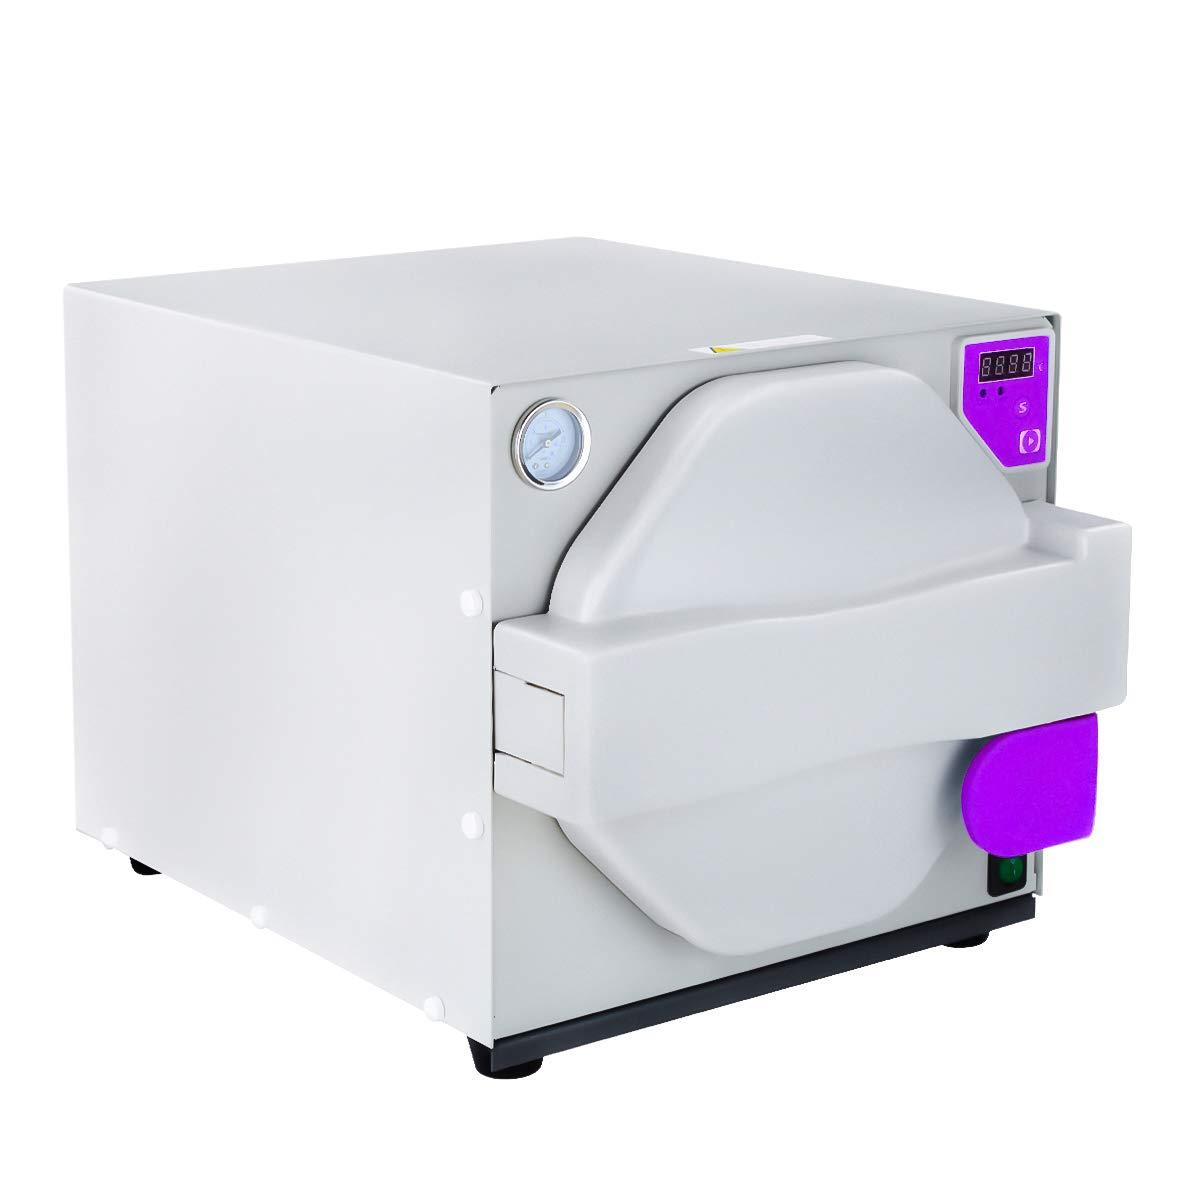 BONEW 18L Autoclave Steam Dental Lab Equipment Tool Mini330 by BONEW (Image #4)